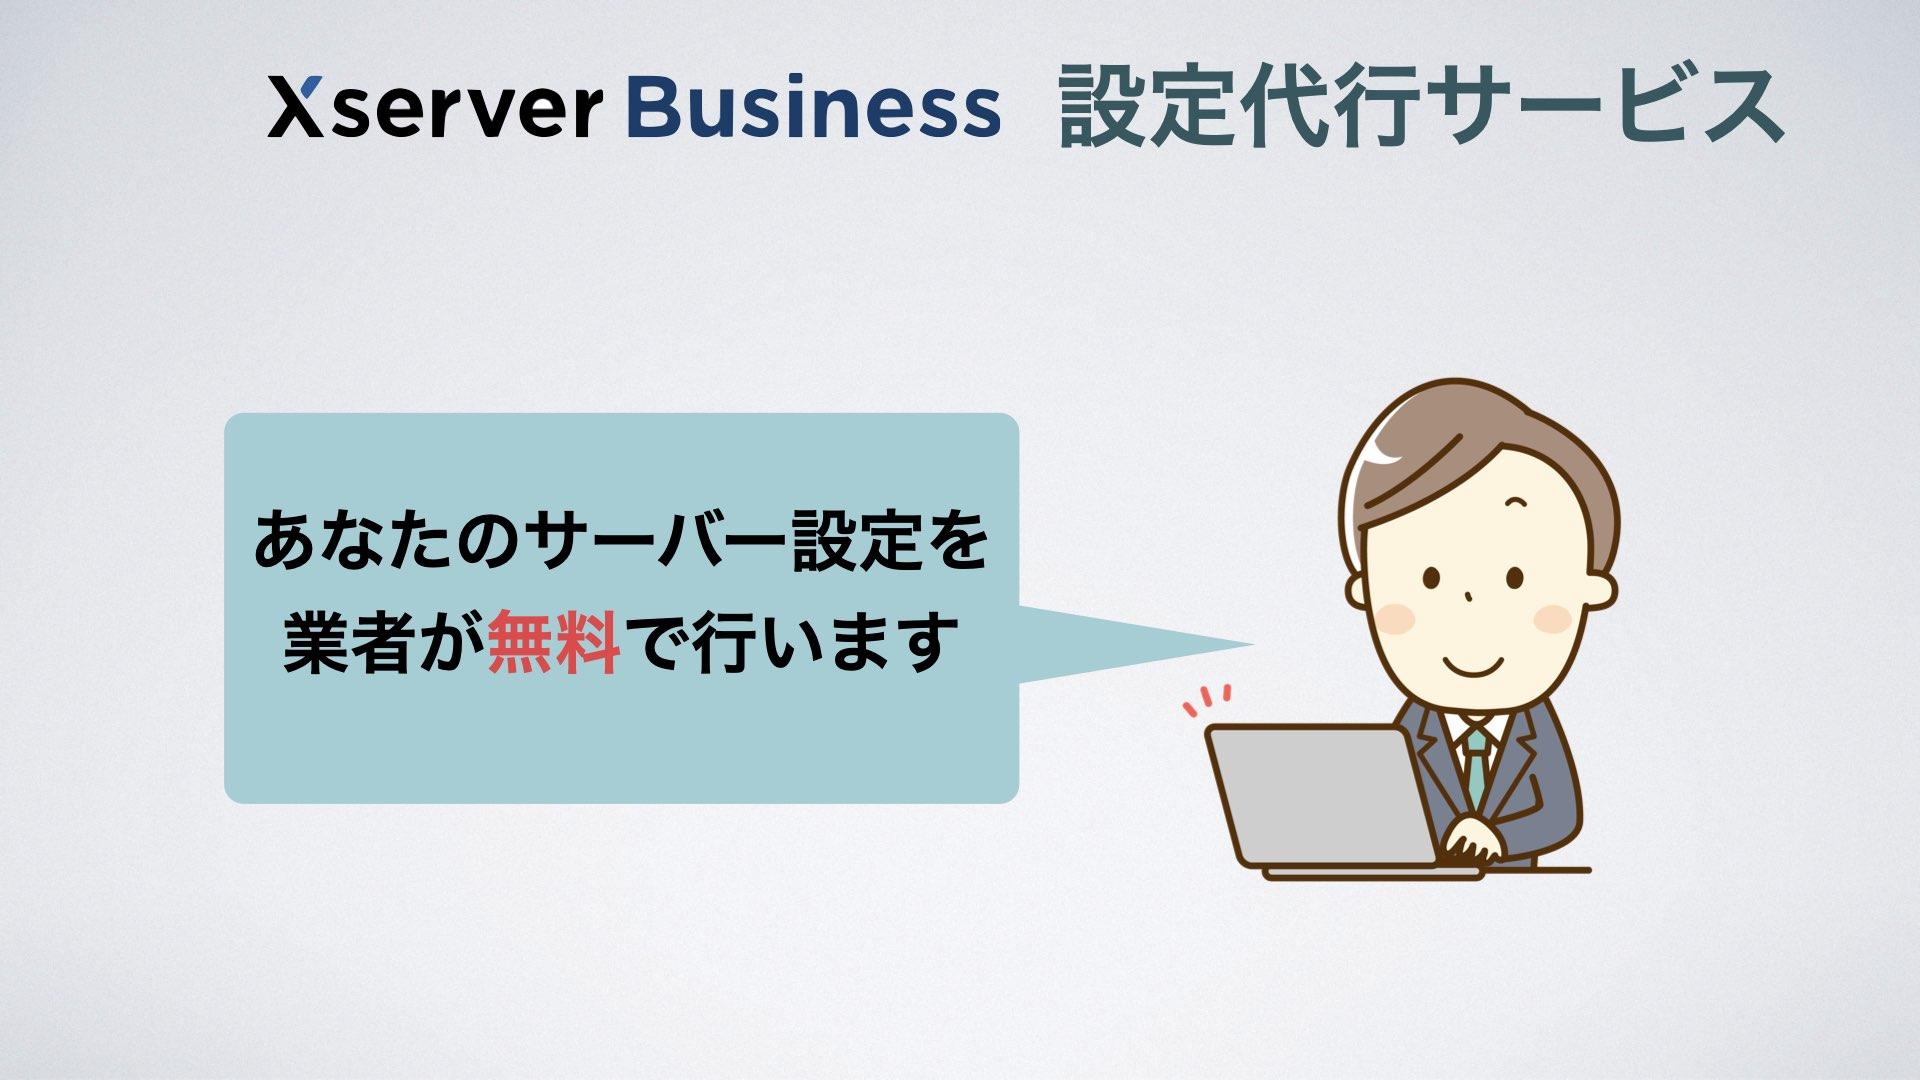 XSERVER Business 設定代行サービスで業務時間短縮